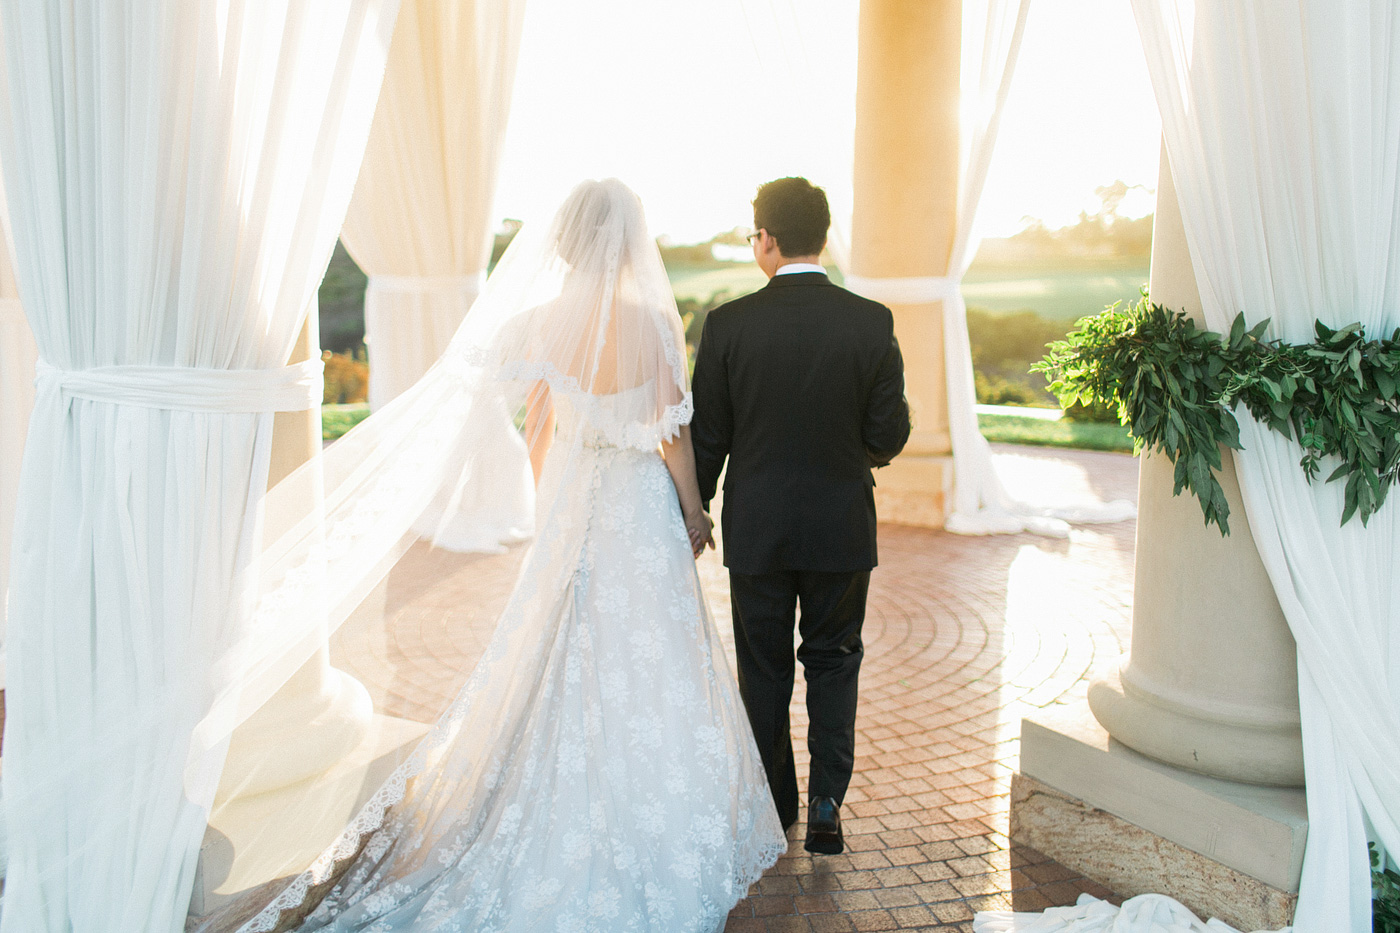 Pelican-hill-wedding-34